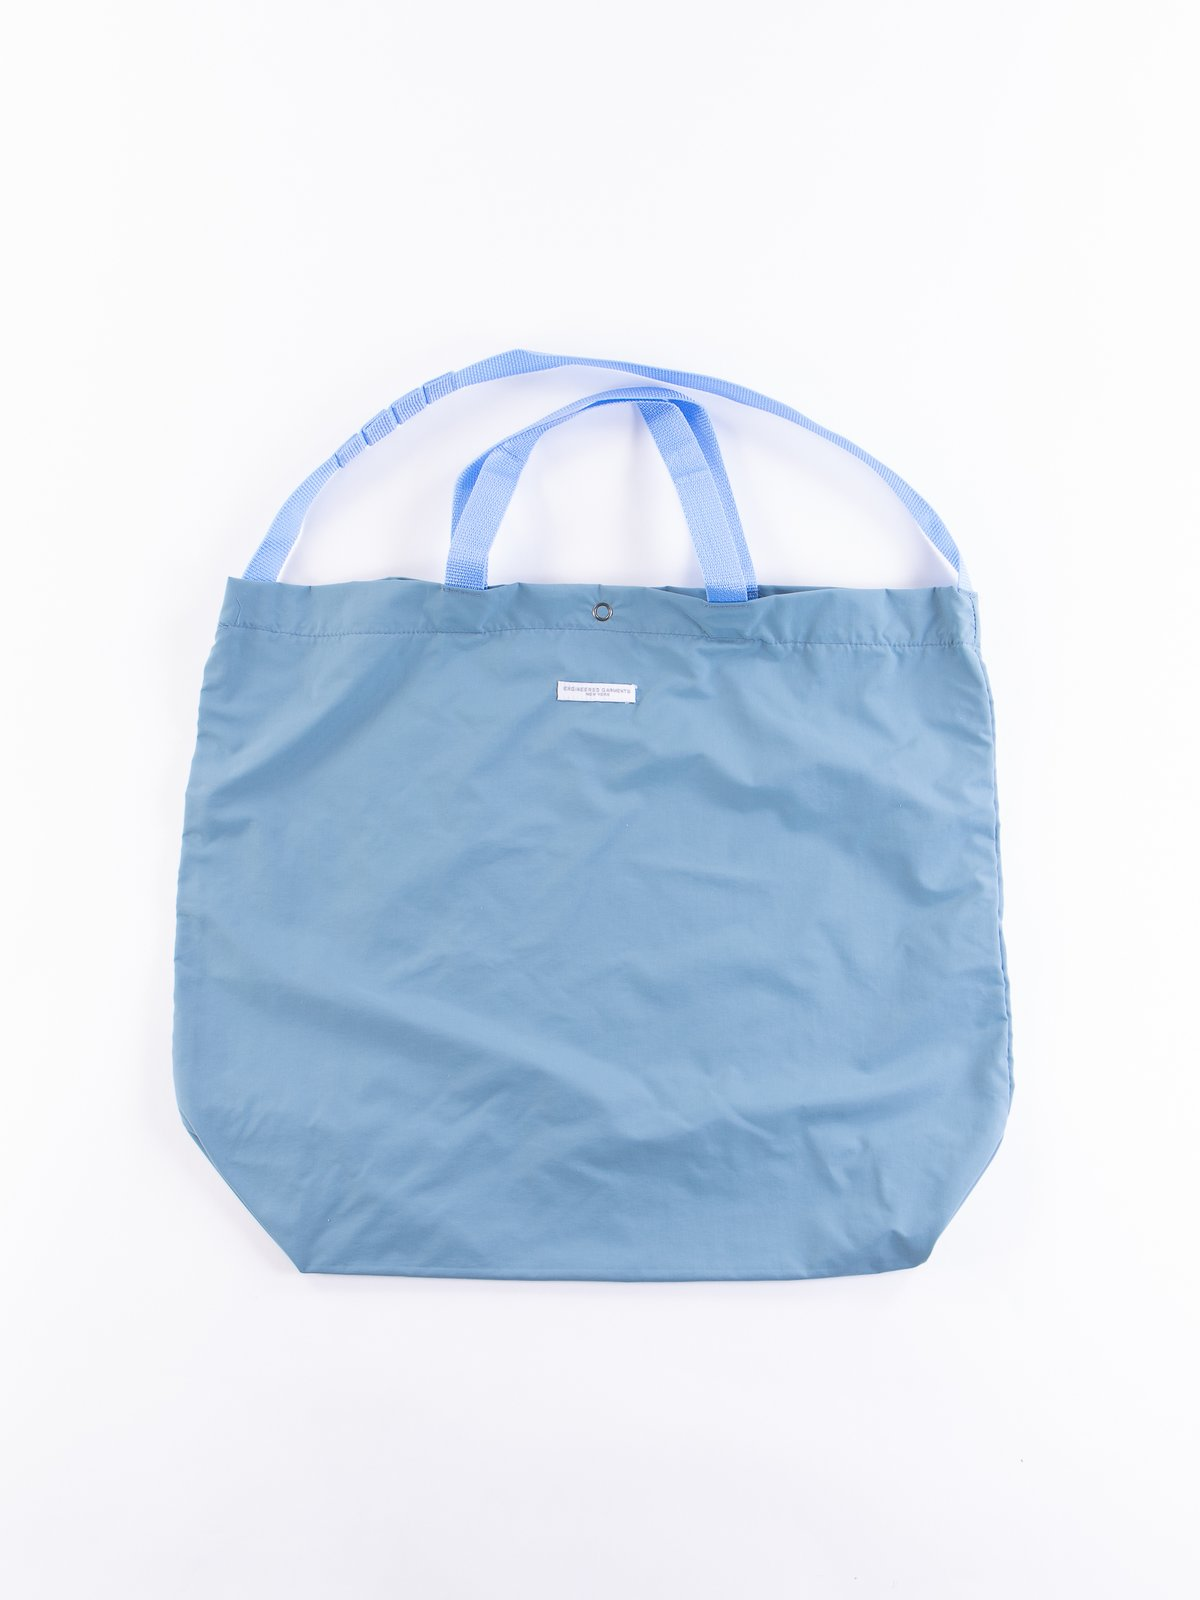 Light Blue Acrylic Coated Nylon Taffeta Carry All Tote - Image 1